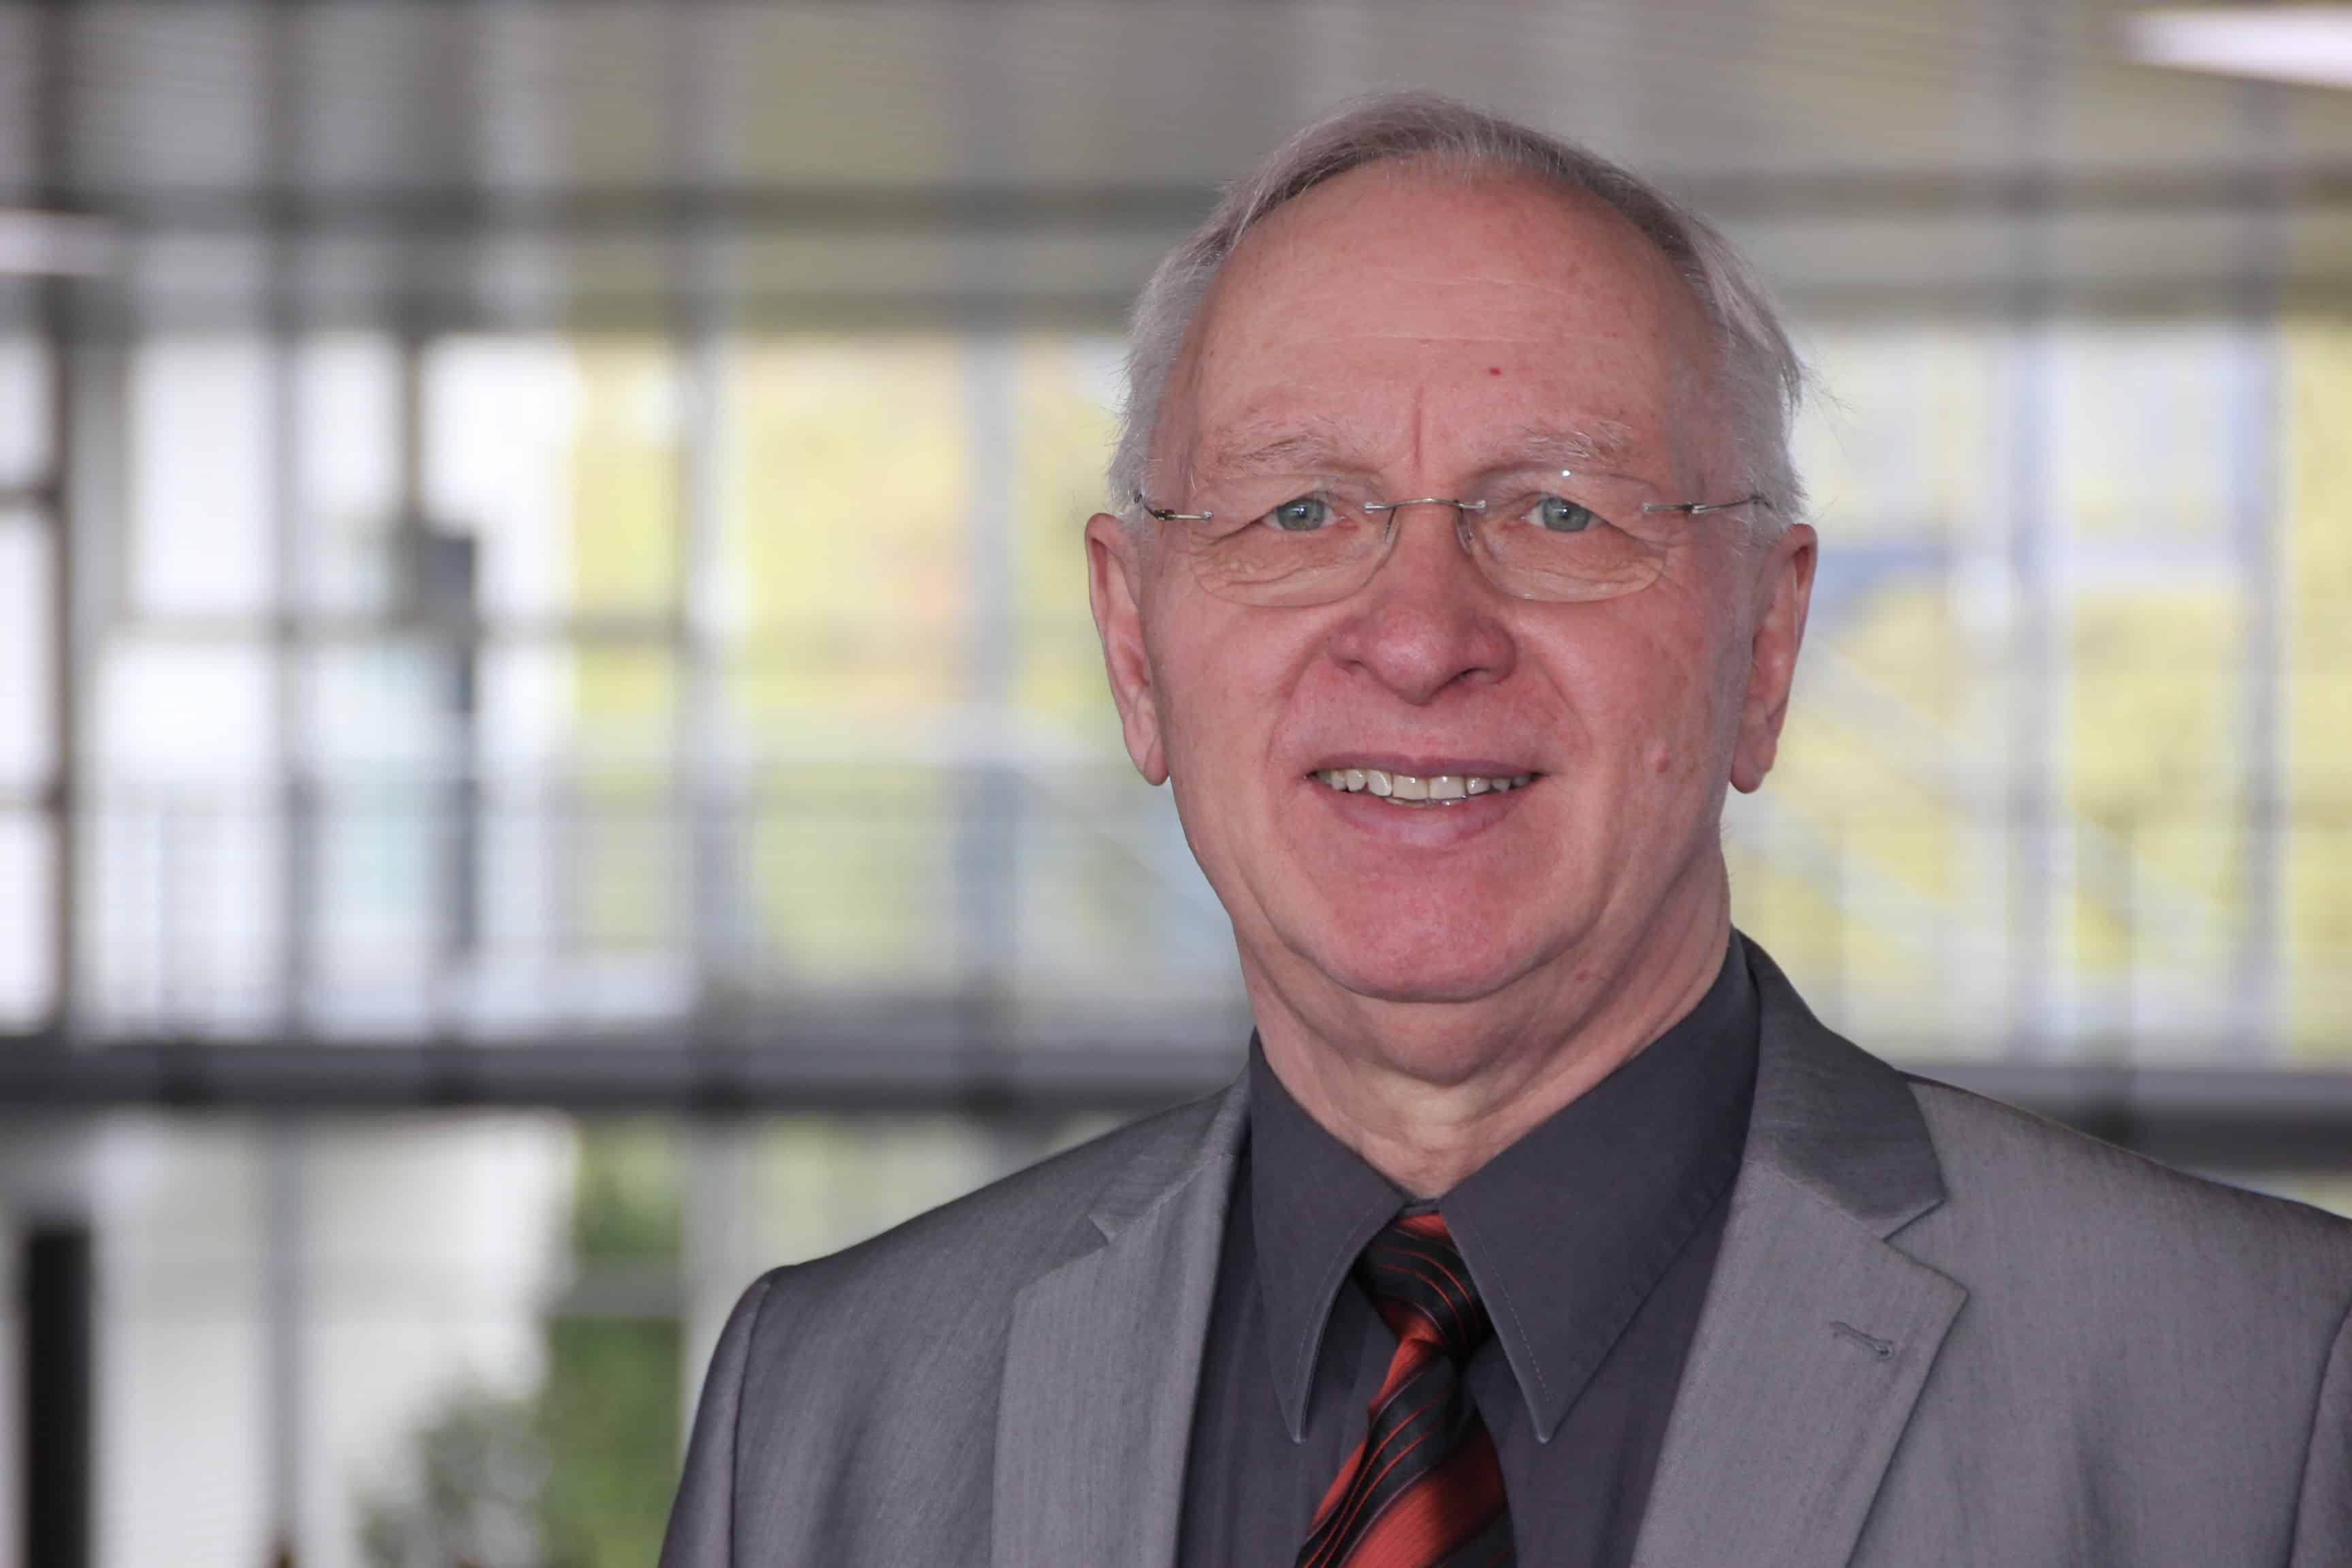 Dr. Wolfhart Margis